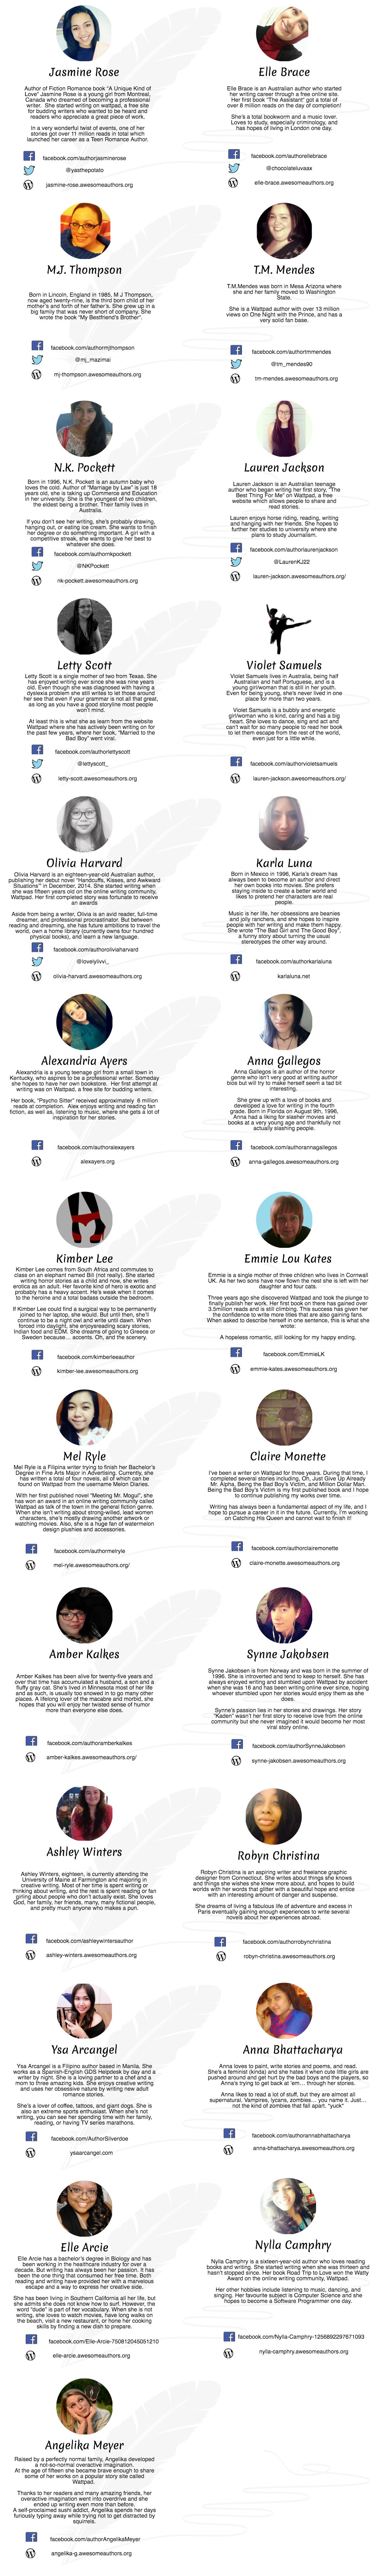 blvnp-authors